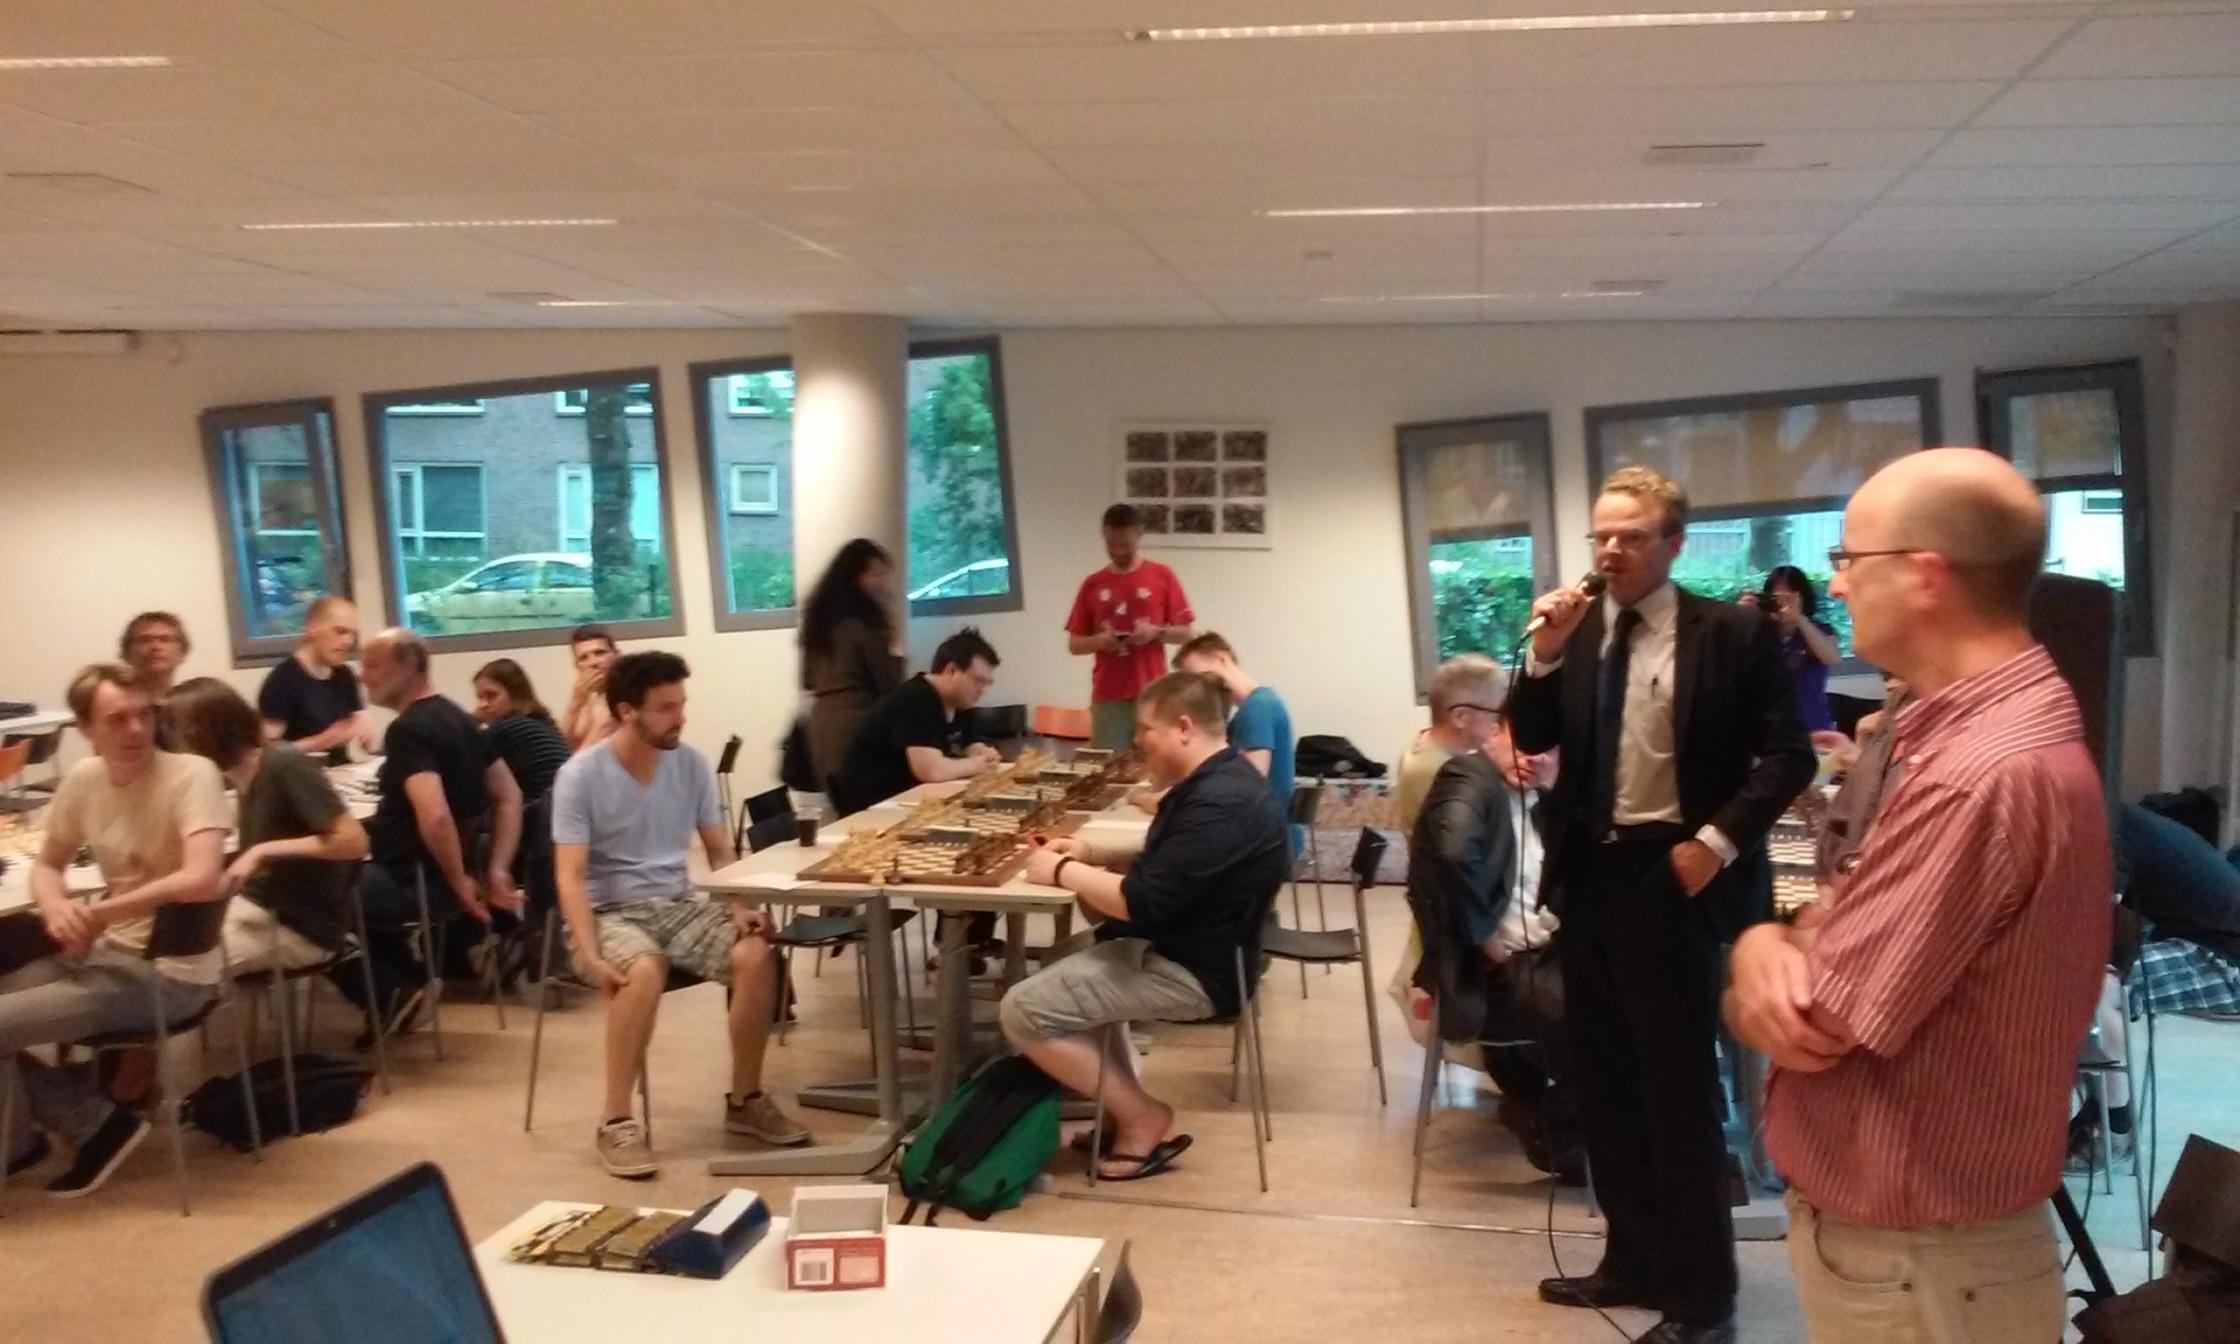 Openingswoord door toernooidirecteur Jan Jaap Janse